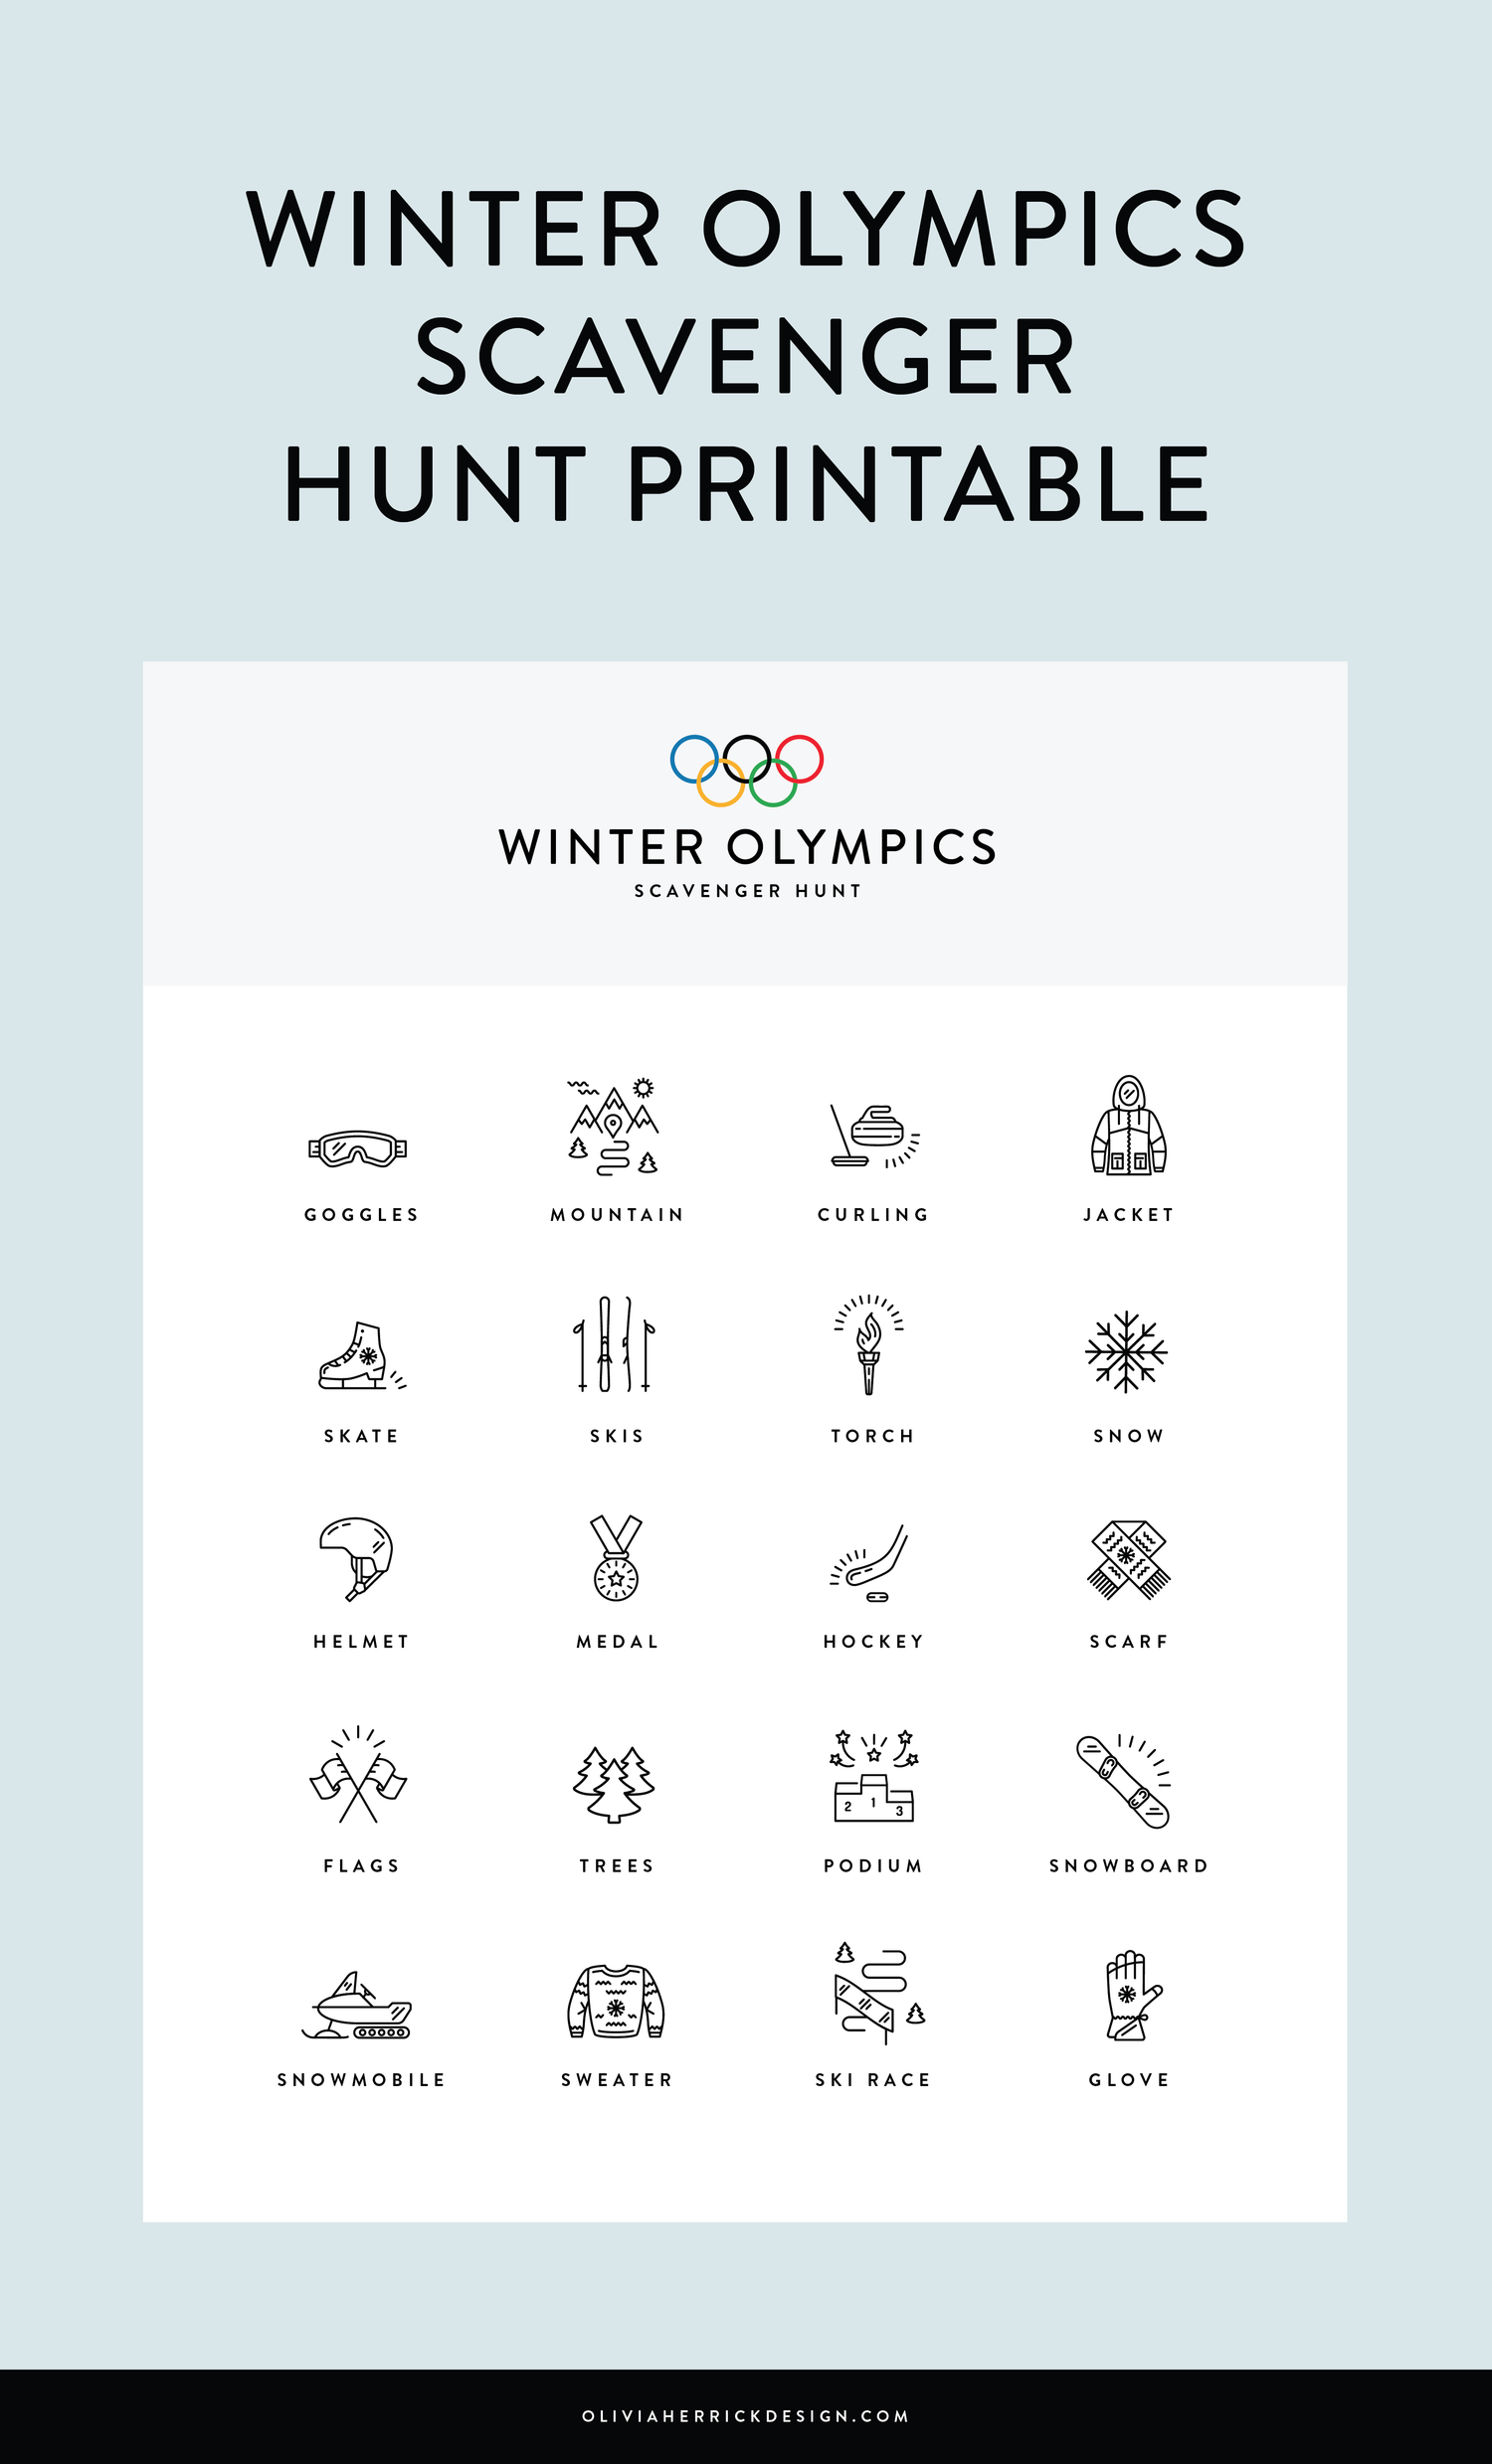 Olympics Scavenger Hunt Coloring Sheets